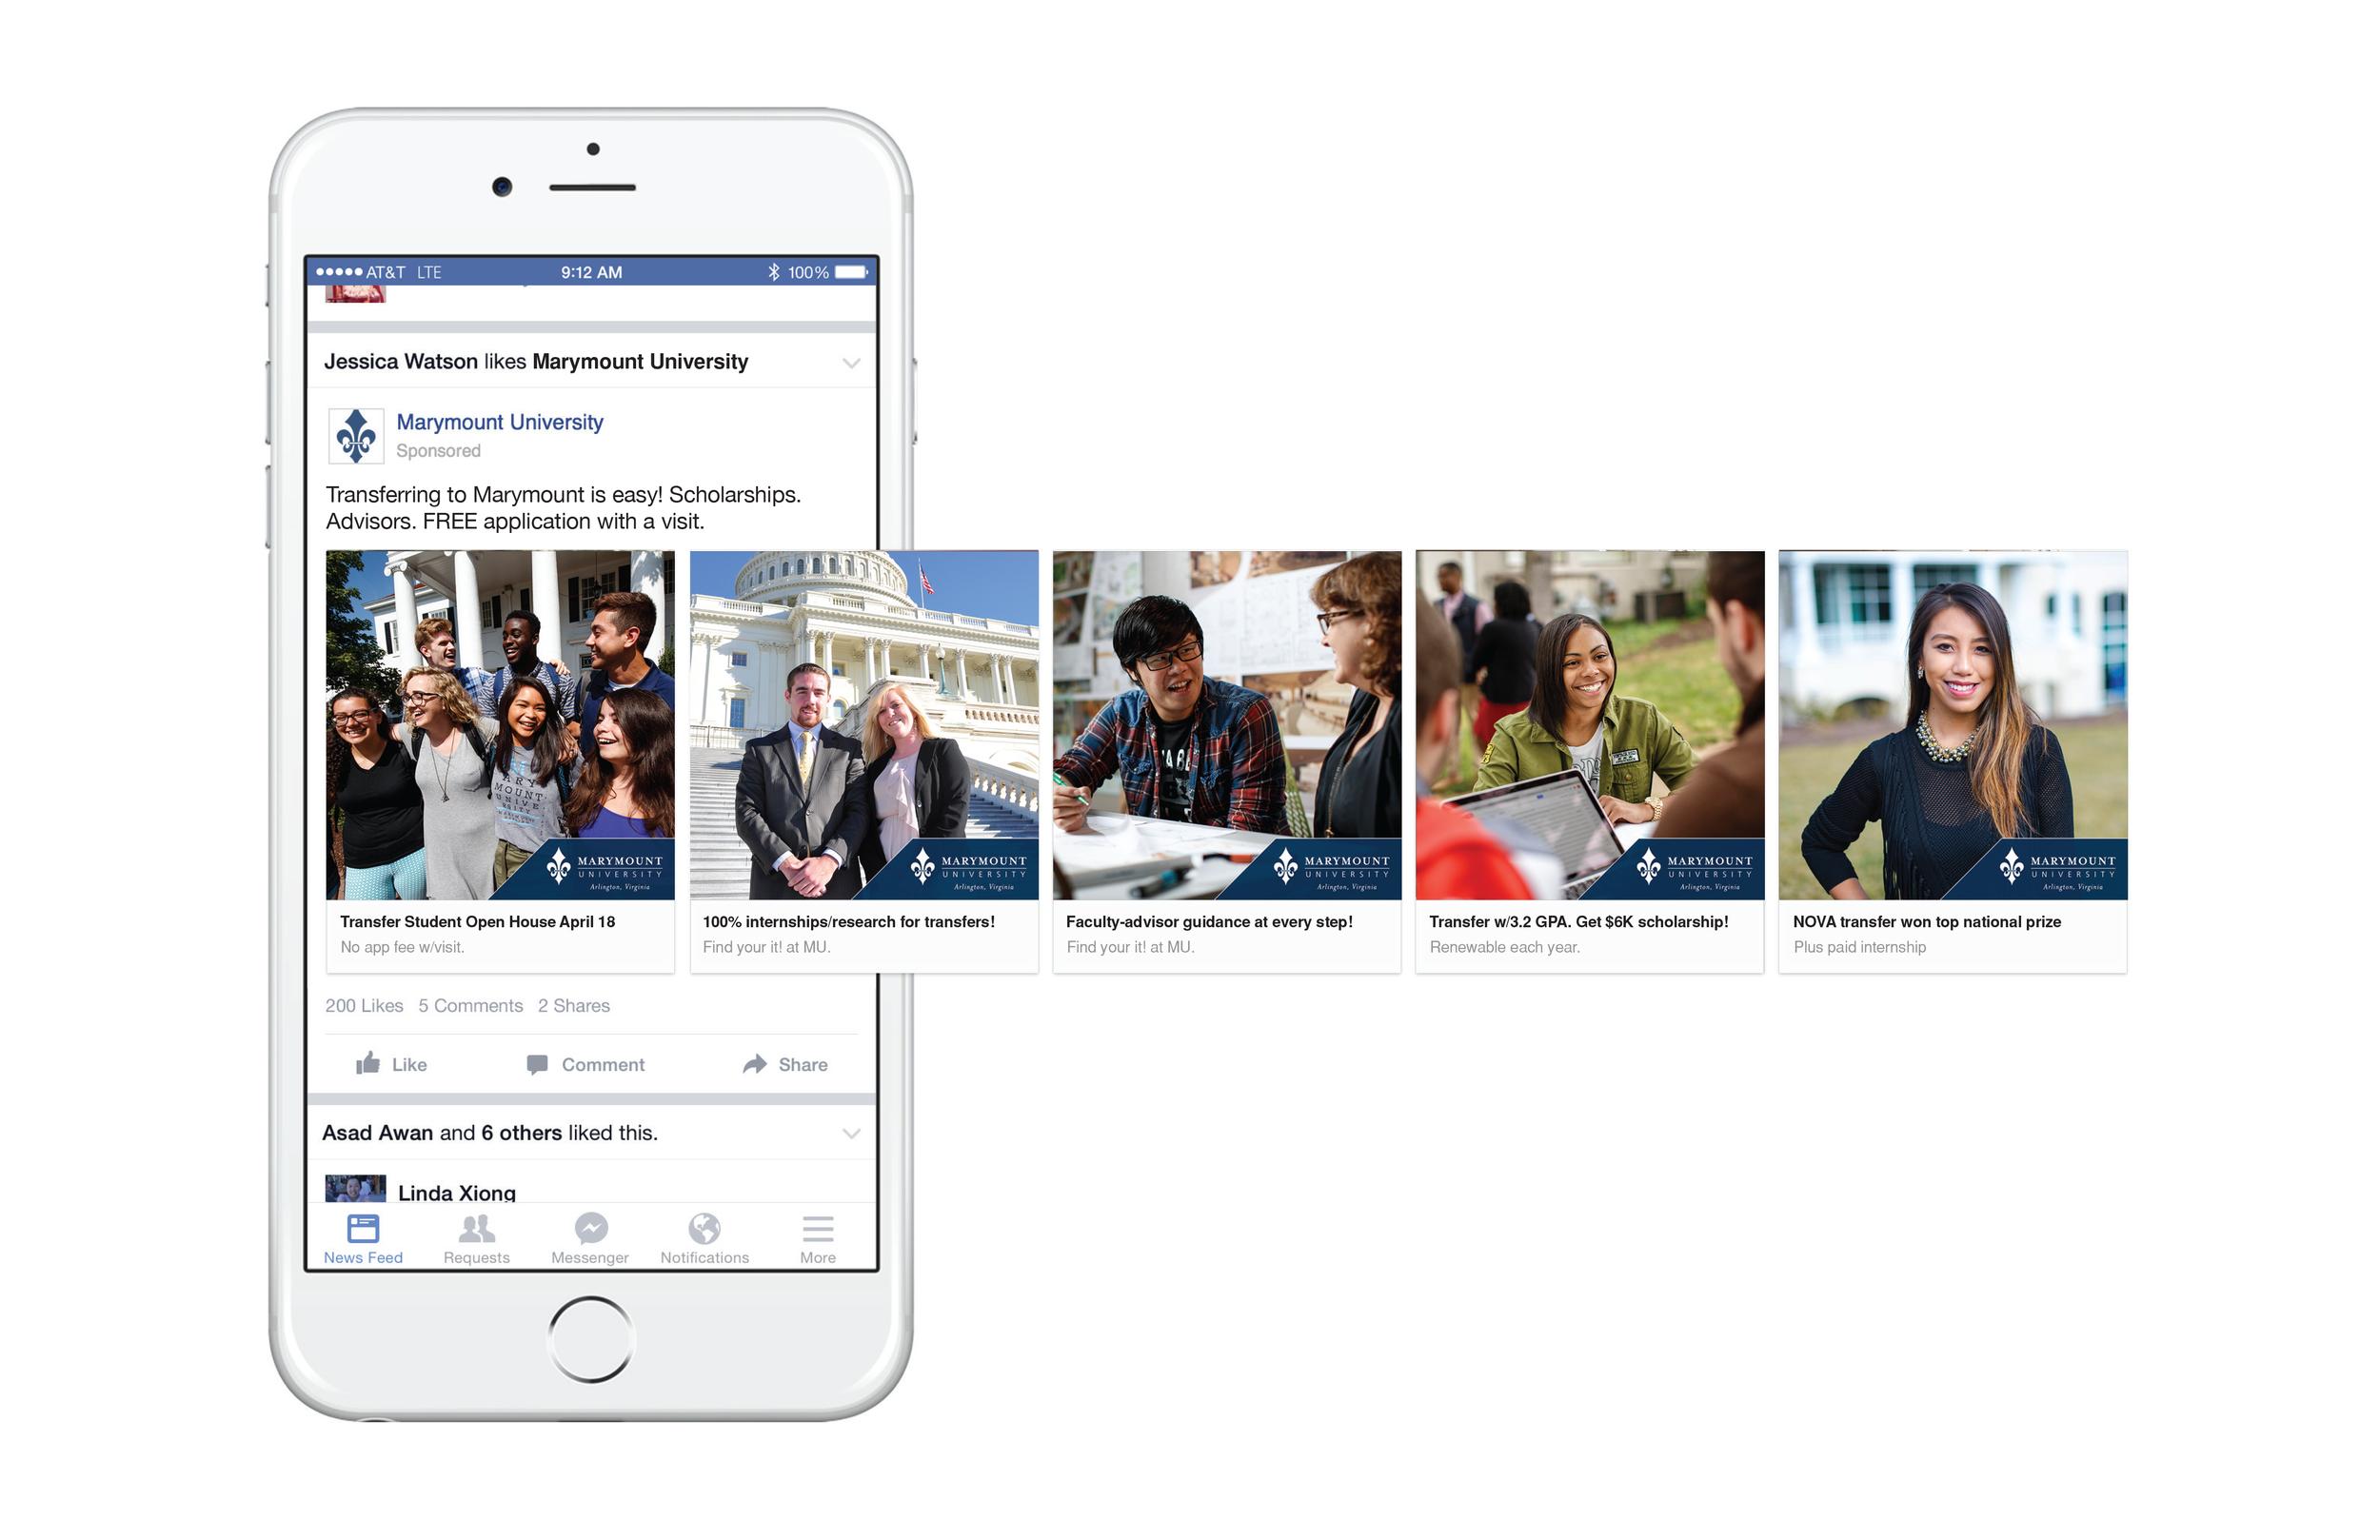 17018MUEM Transfer Student Carousel Facebook Ads 2.png